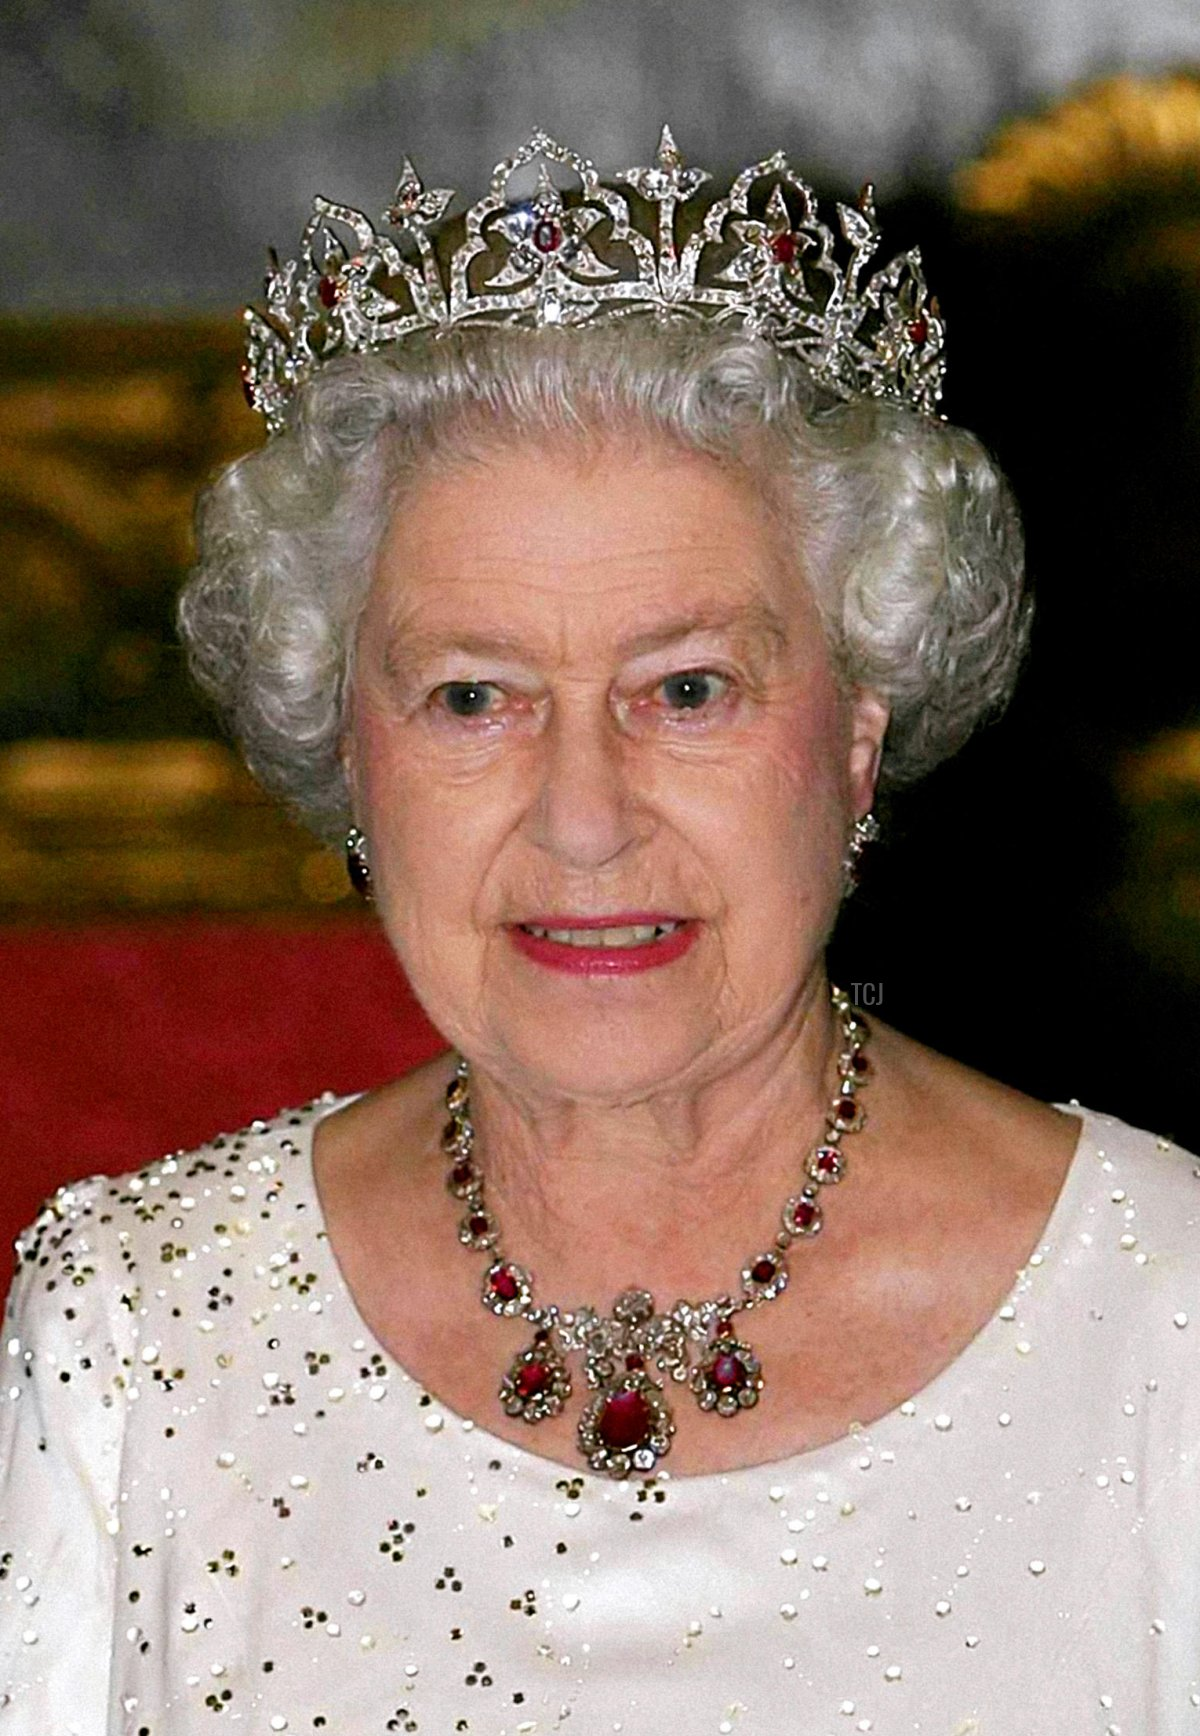 Queen Elizabeth II attends a banquet in Malta, 2005